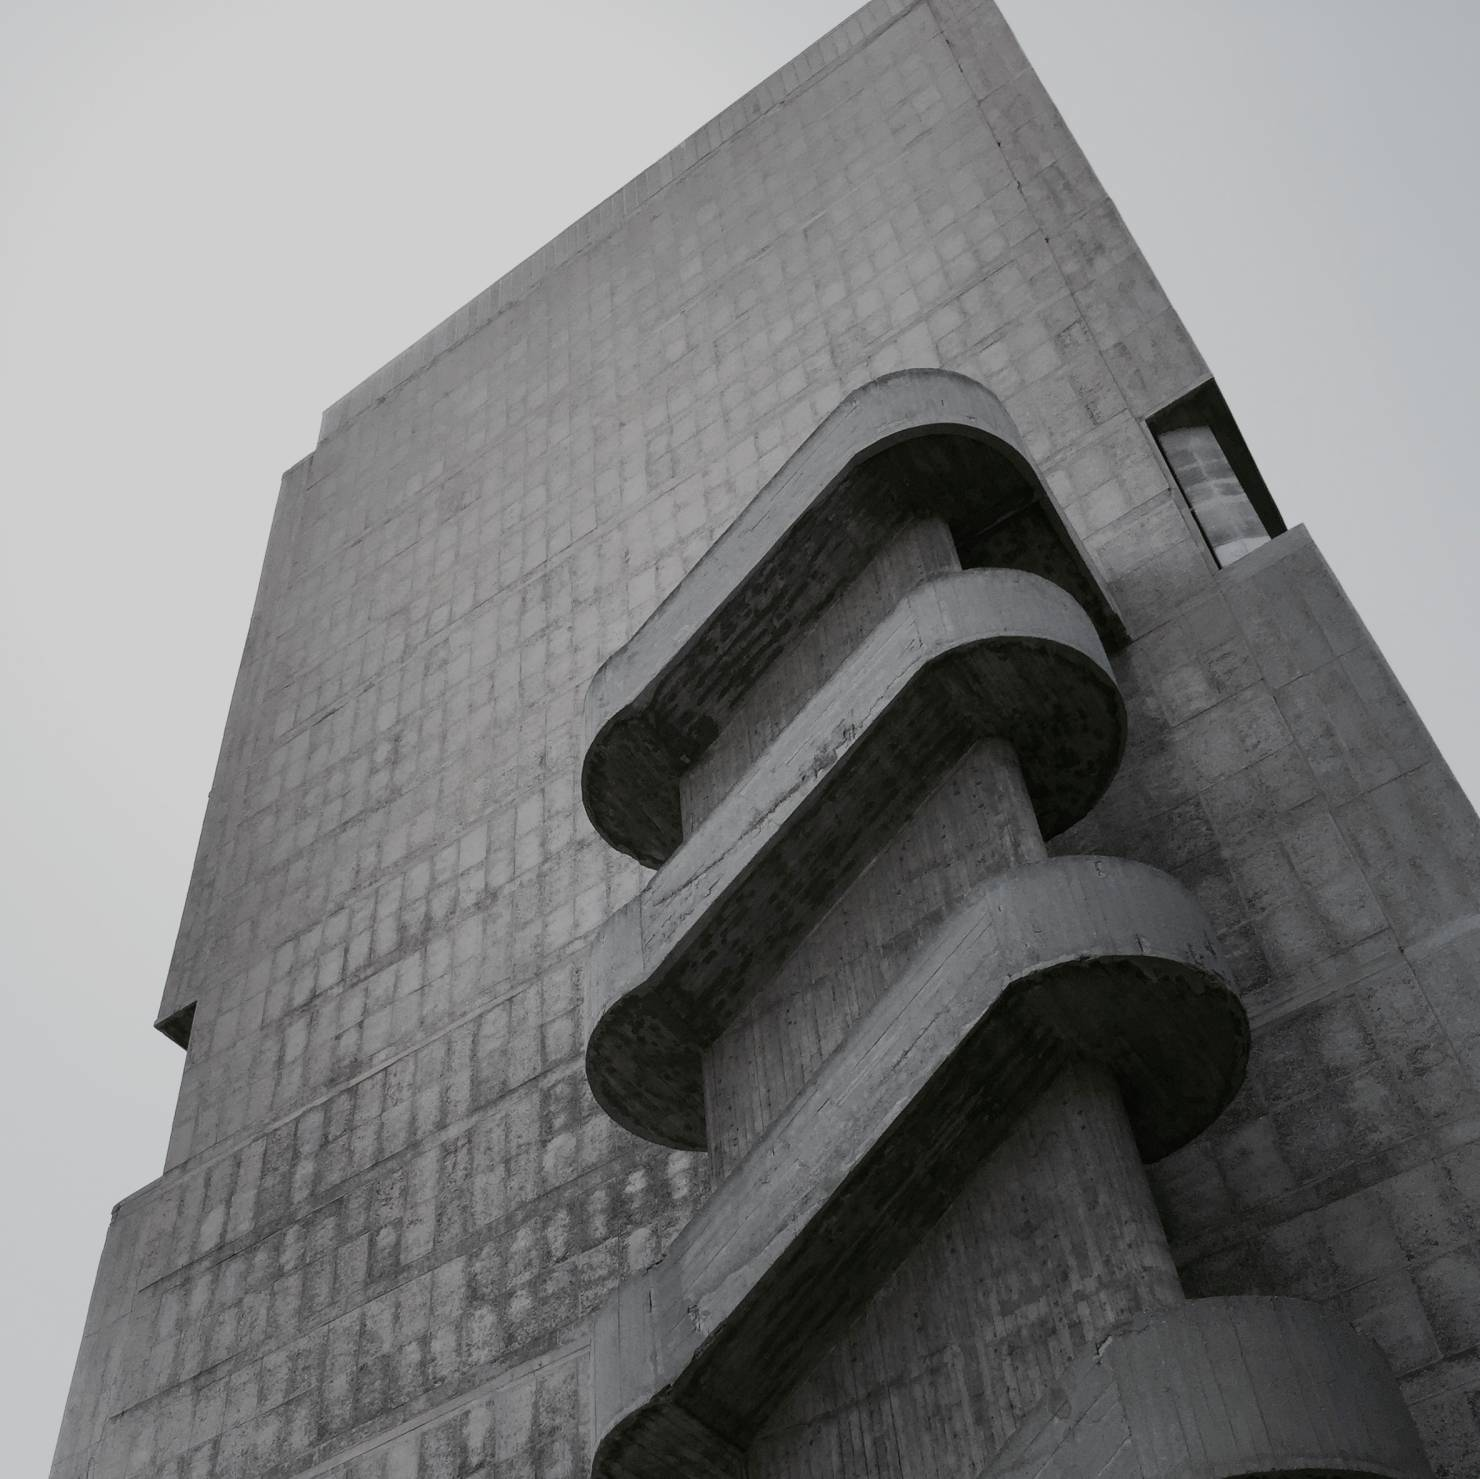 le_corbusier_unite_d-habitation_marseille_patrick_schuttler_001-676f483724481426fff23696e79872a9